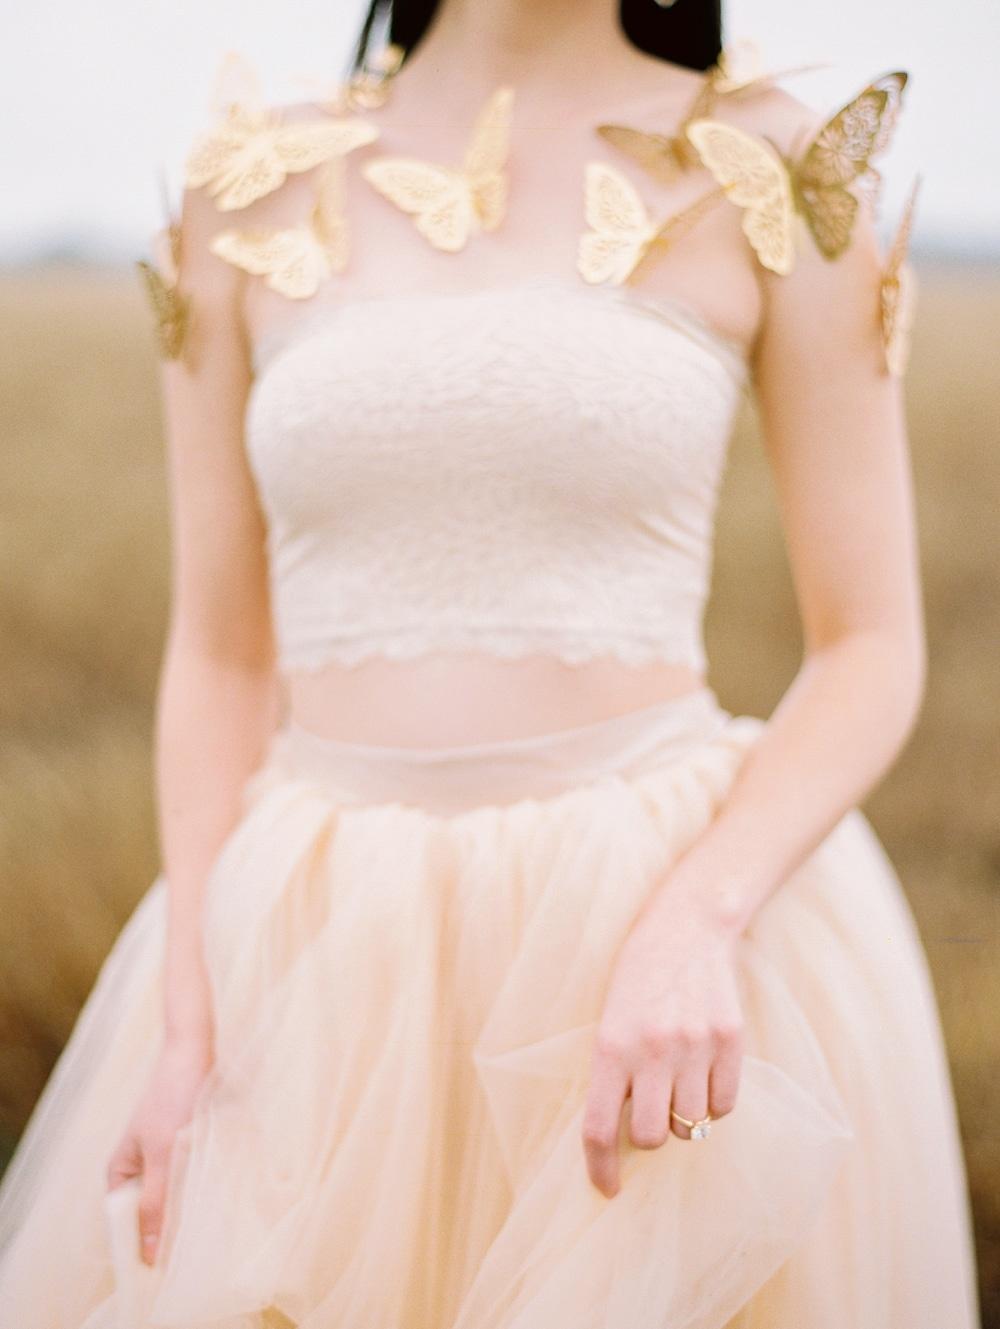 Kristin-La-Voie-Photography-fine-art-wedding-bridal-boudoir-texas-photographer-Dallas-Austin-San-Marcos-wahwahtaysee-resort-36